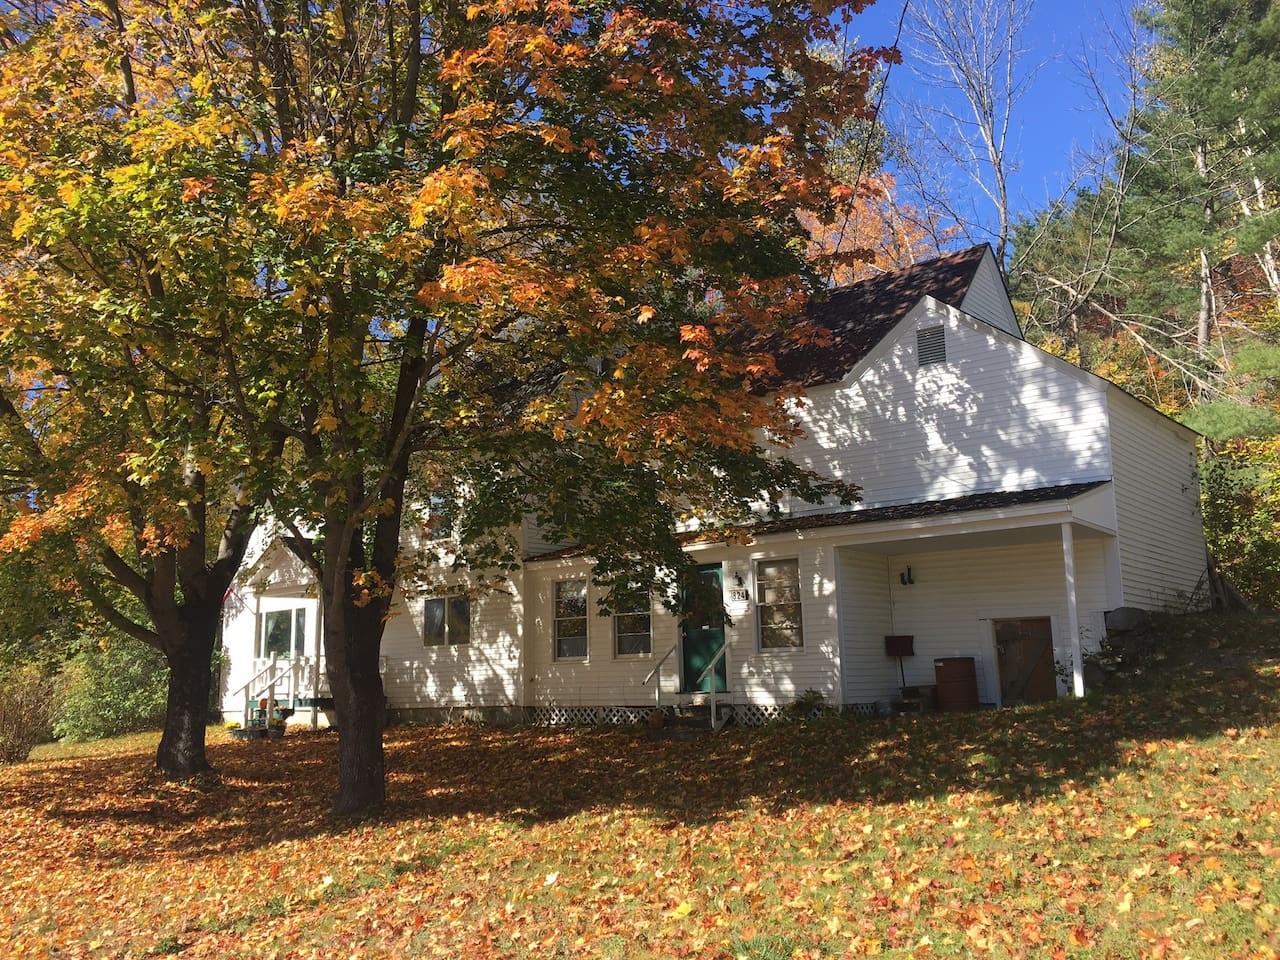 Beautiful vibrant fall foliage- a must see